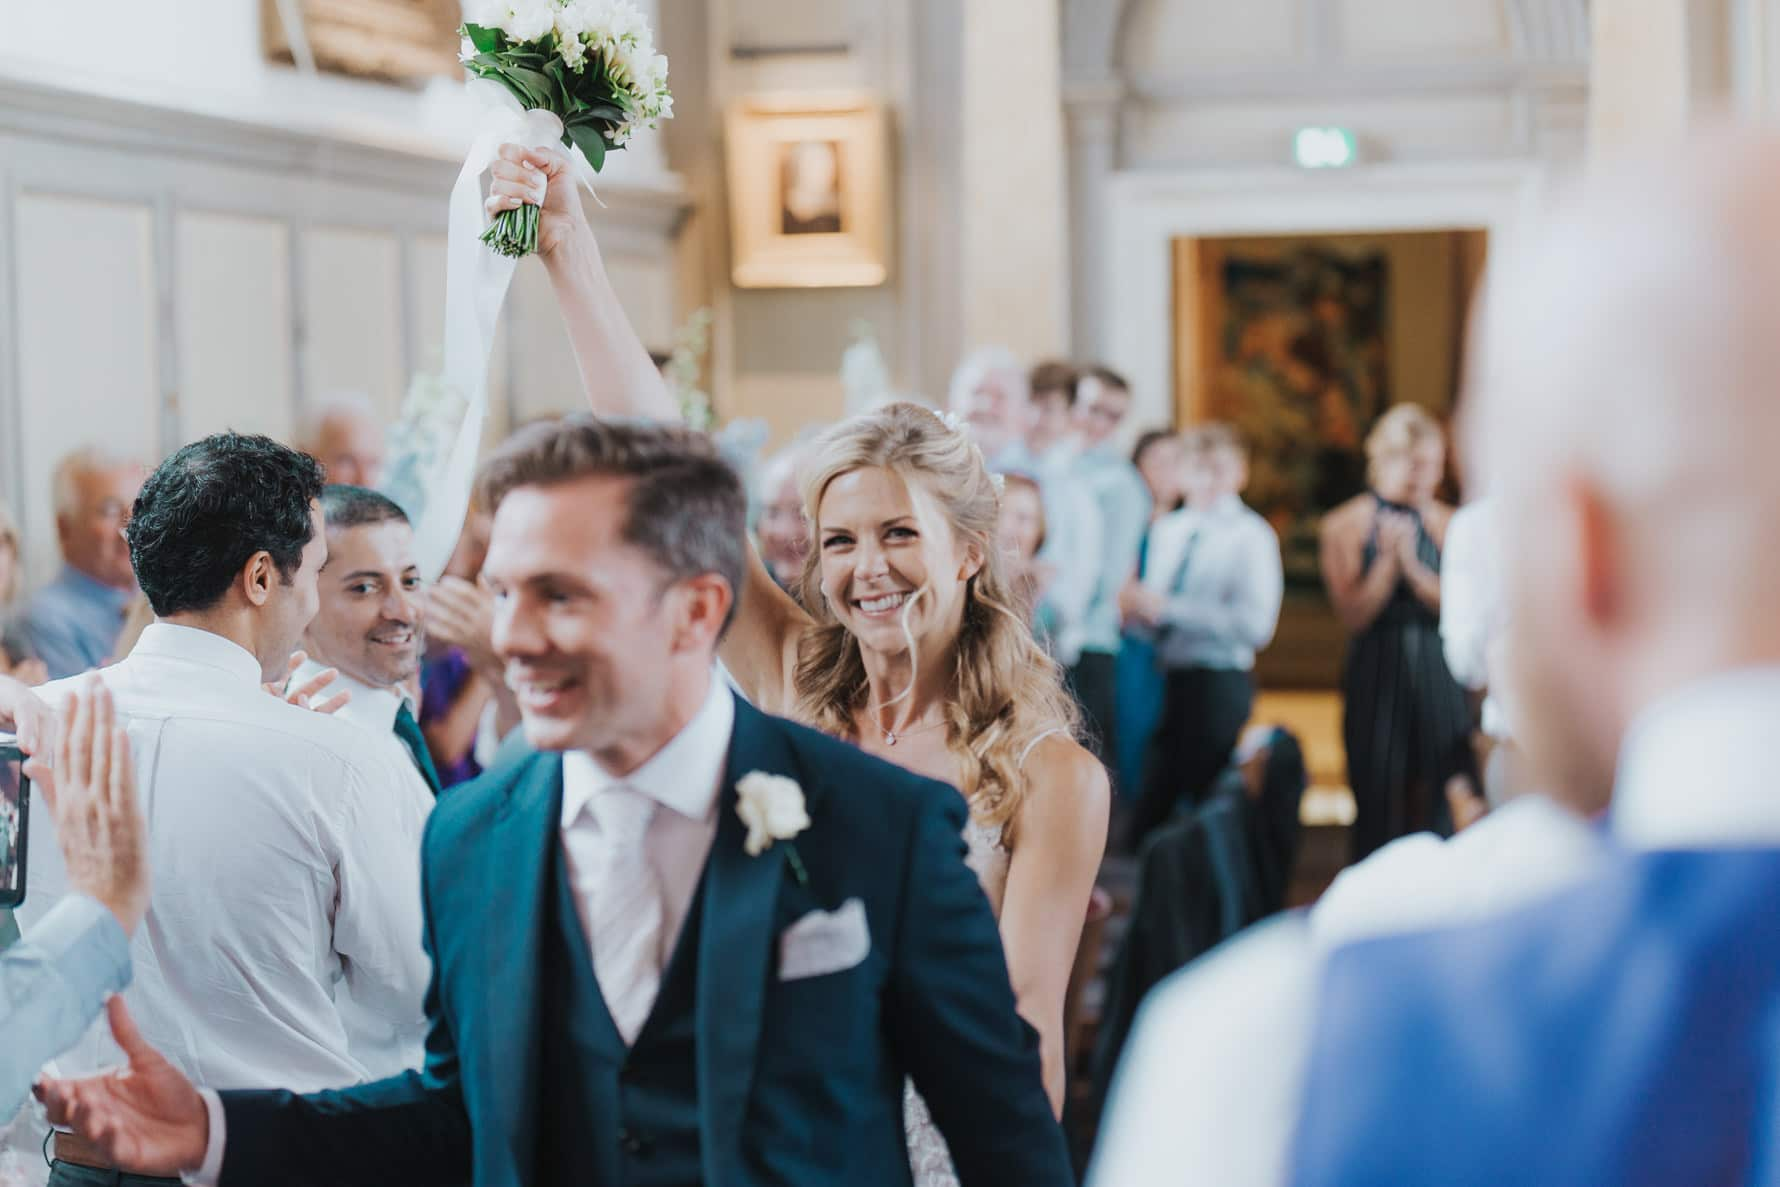 Bride and groom entering their wedding reception